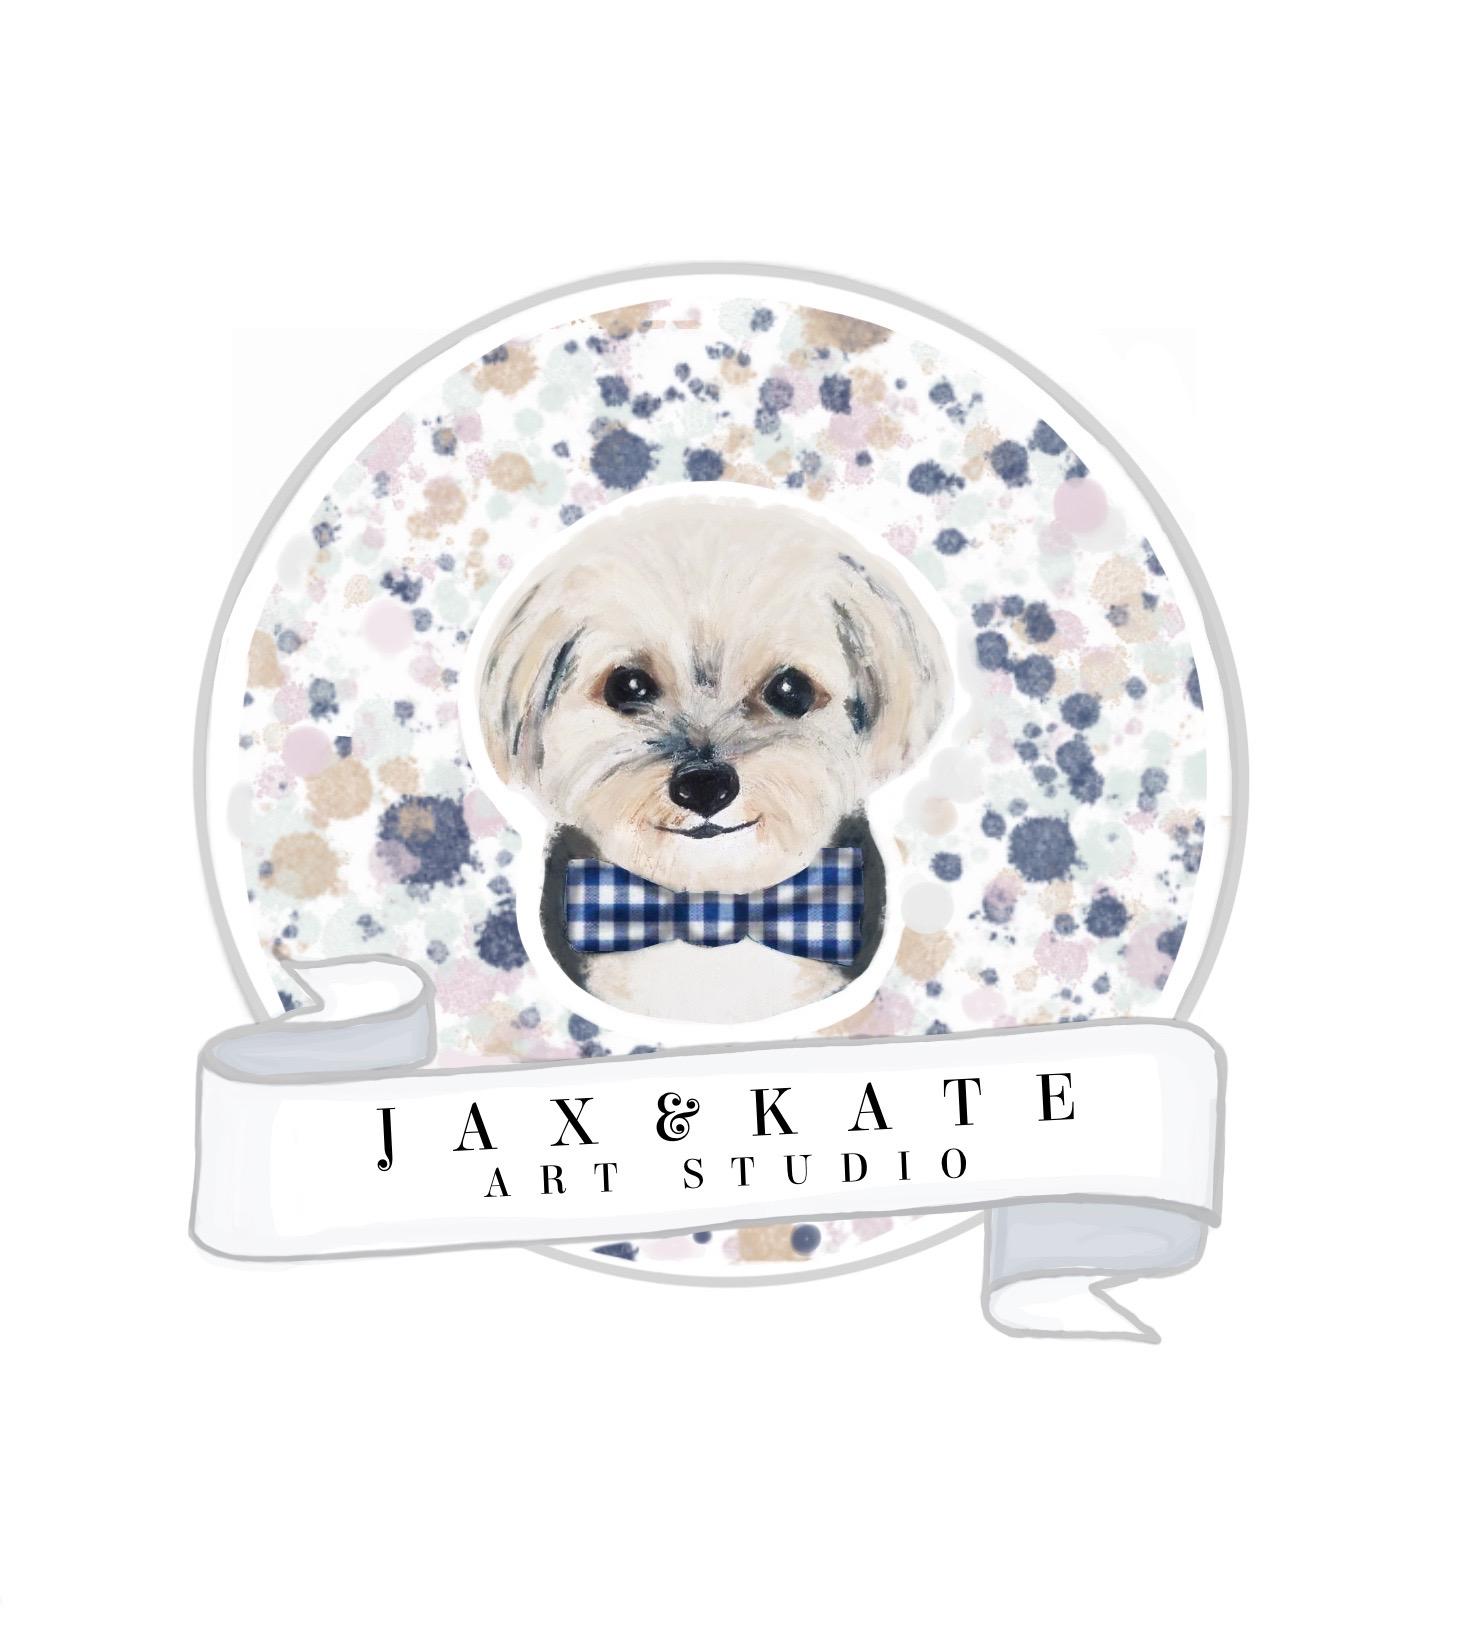 Jax and Kate Art Studio logo